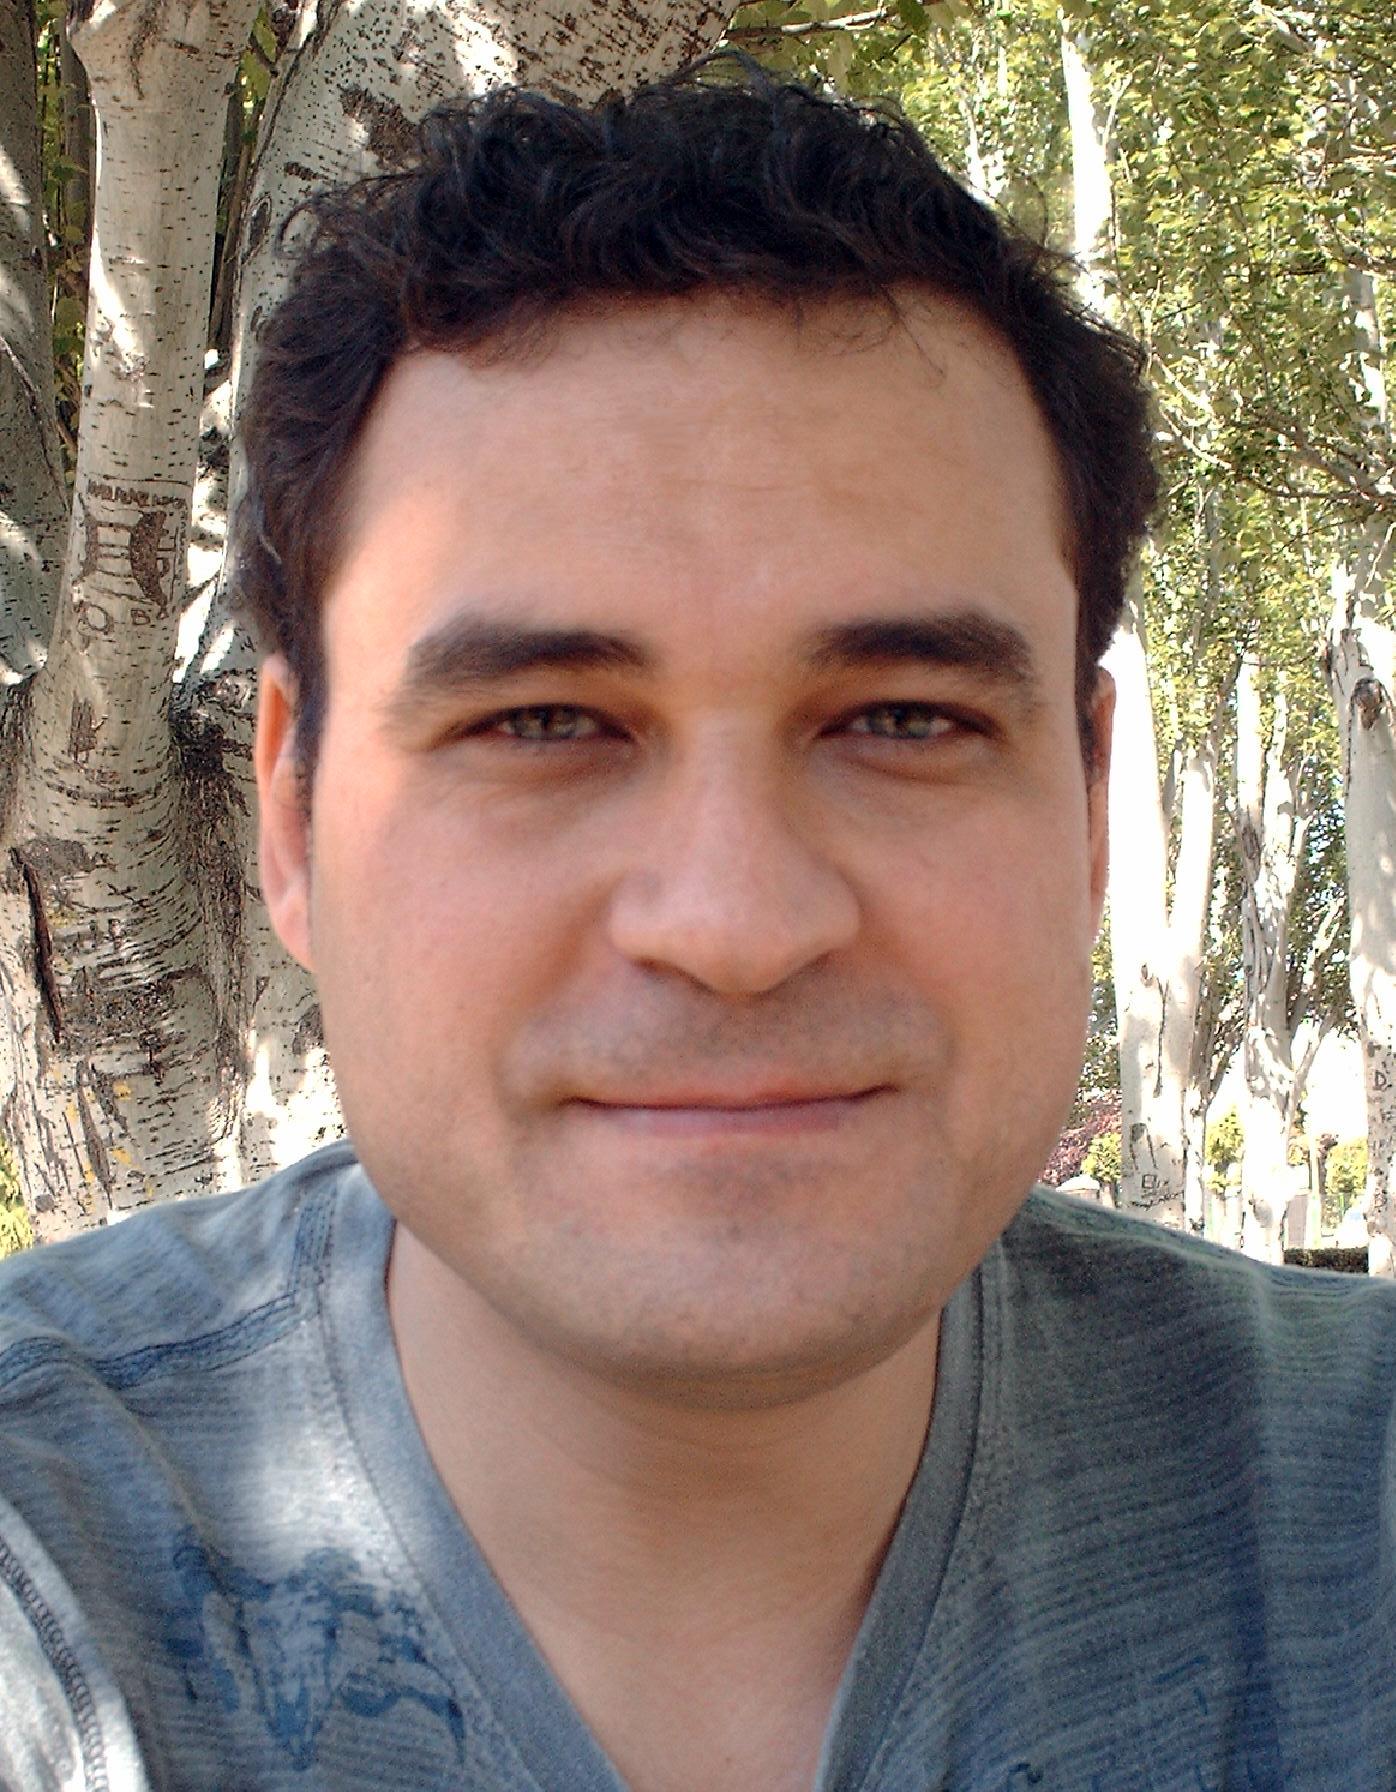 Javier Martínez - JavierMartinez